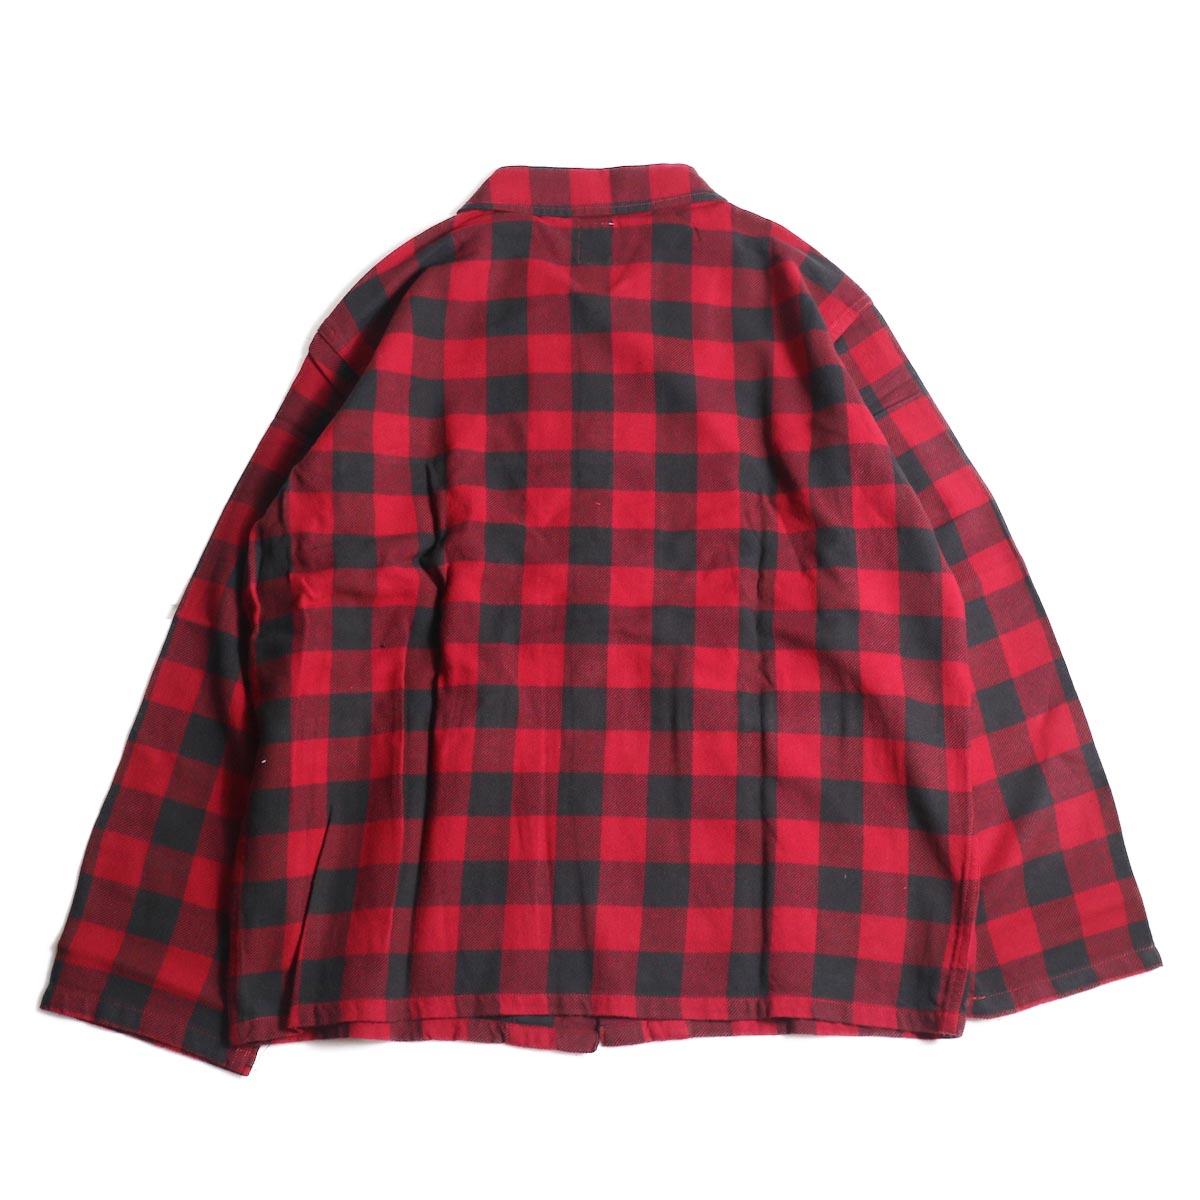 South2 West8 / Hunting Shirt -Plaid Twill (Red/Black)背面